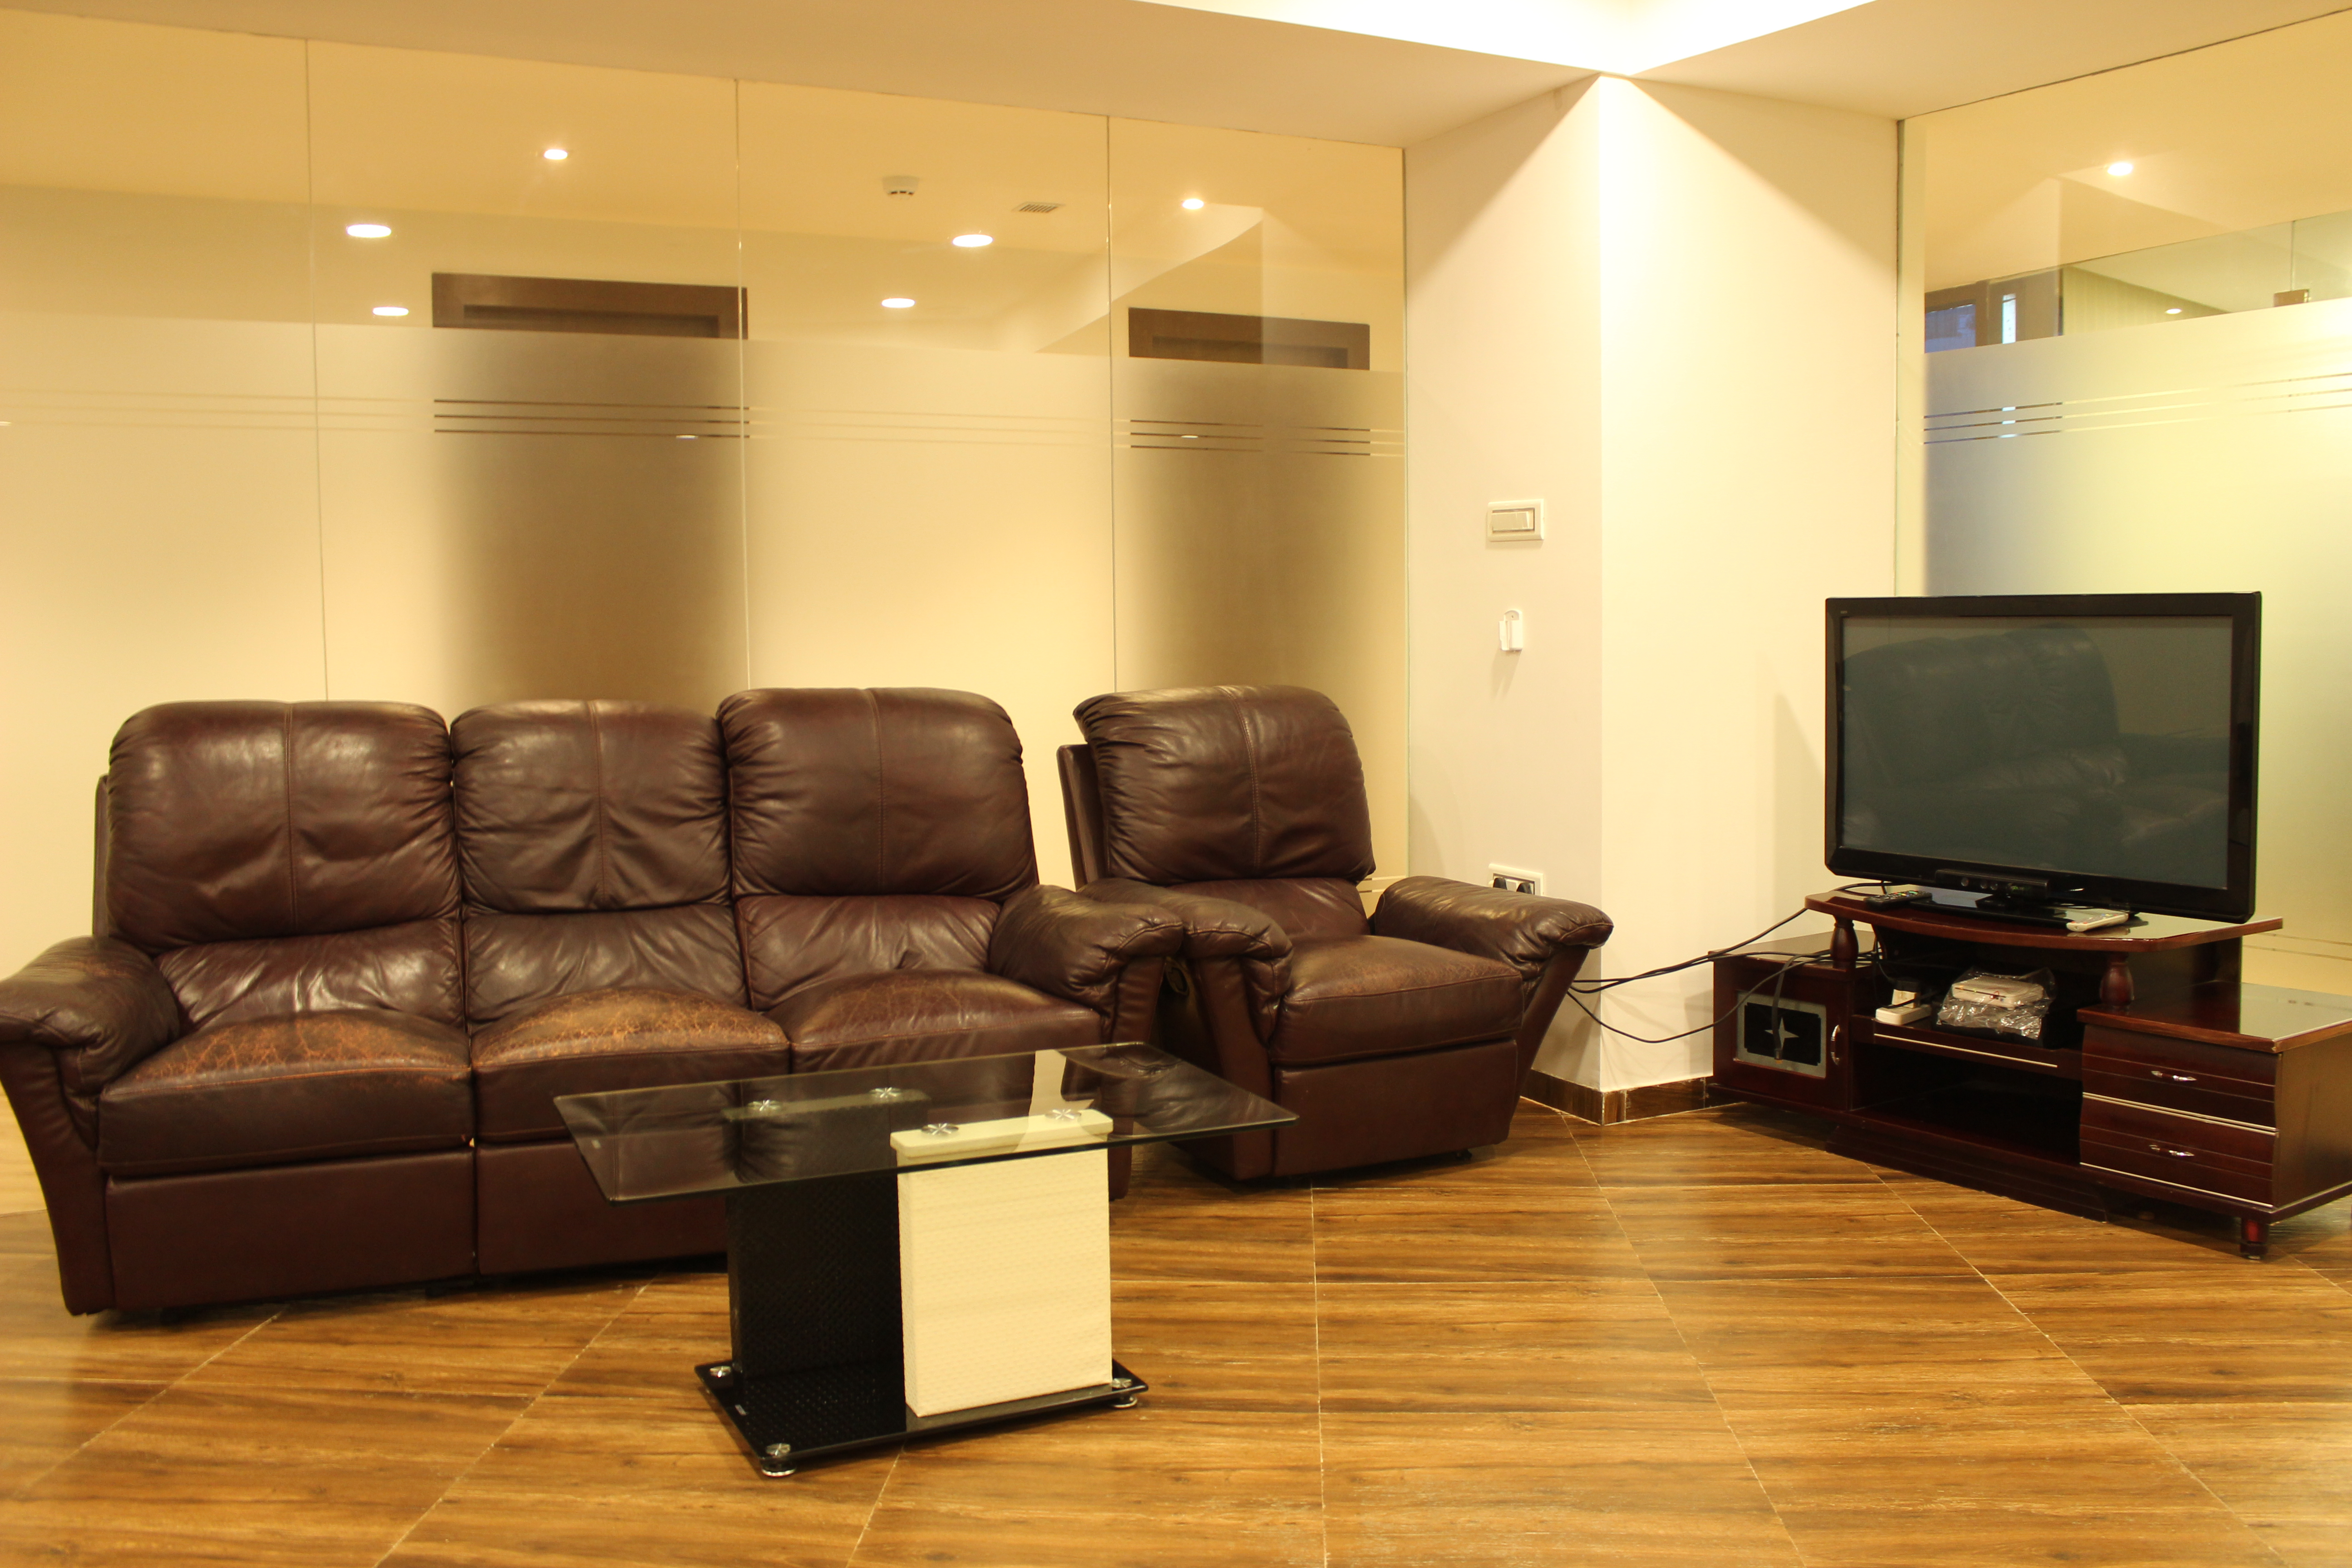 Gamesroom 1